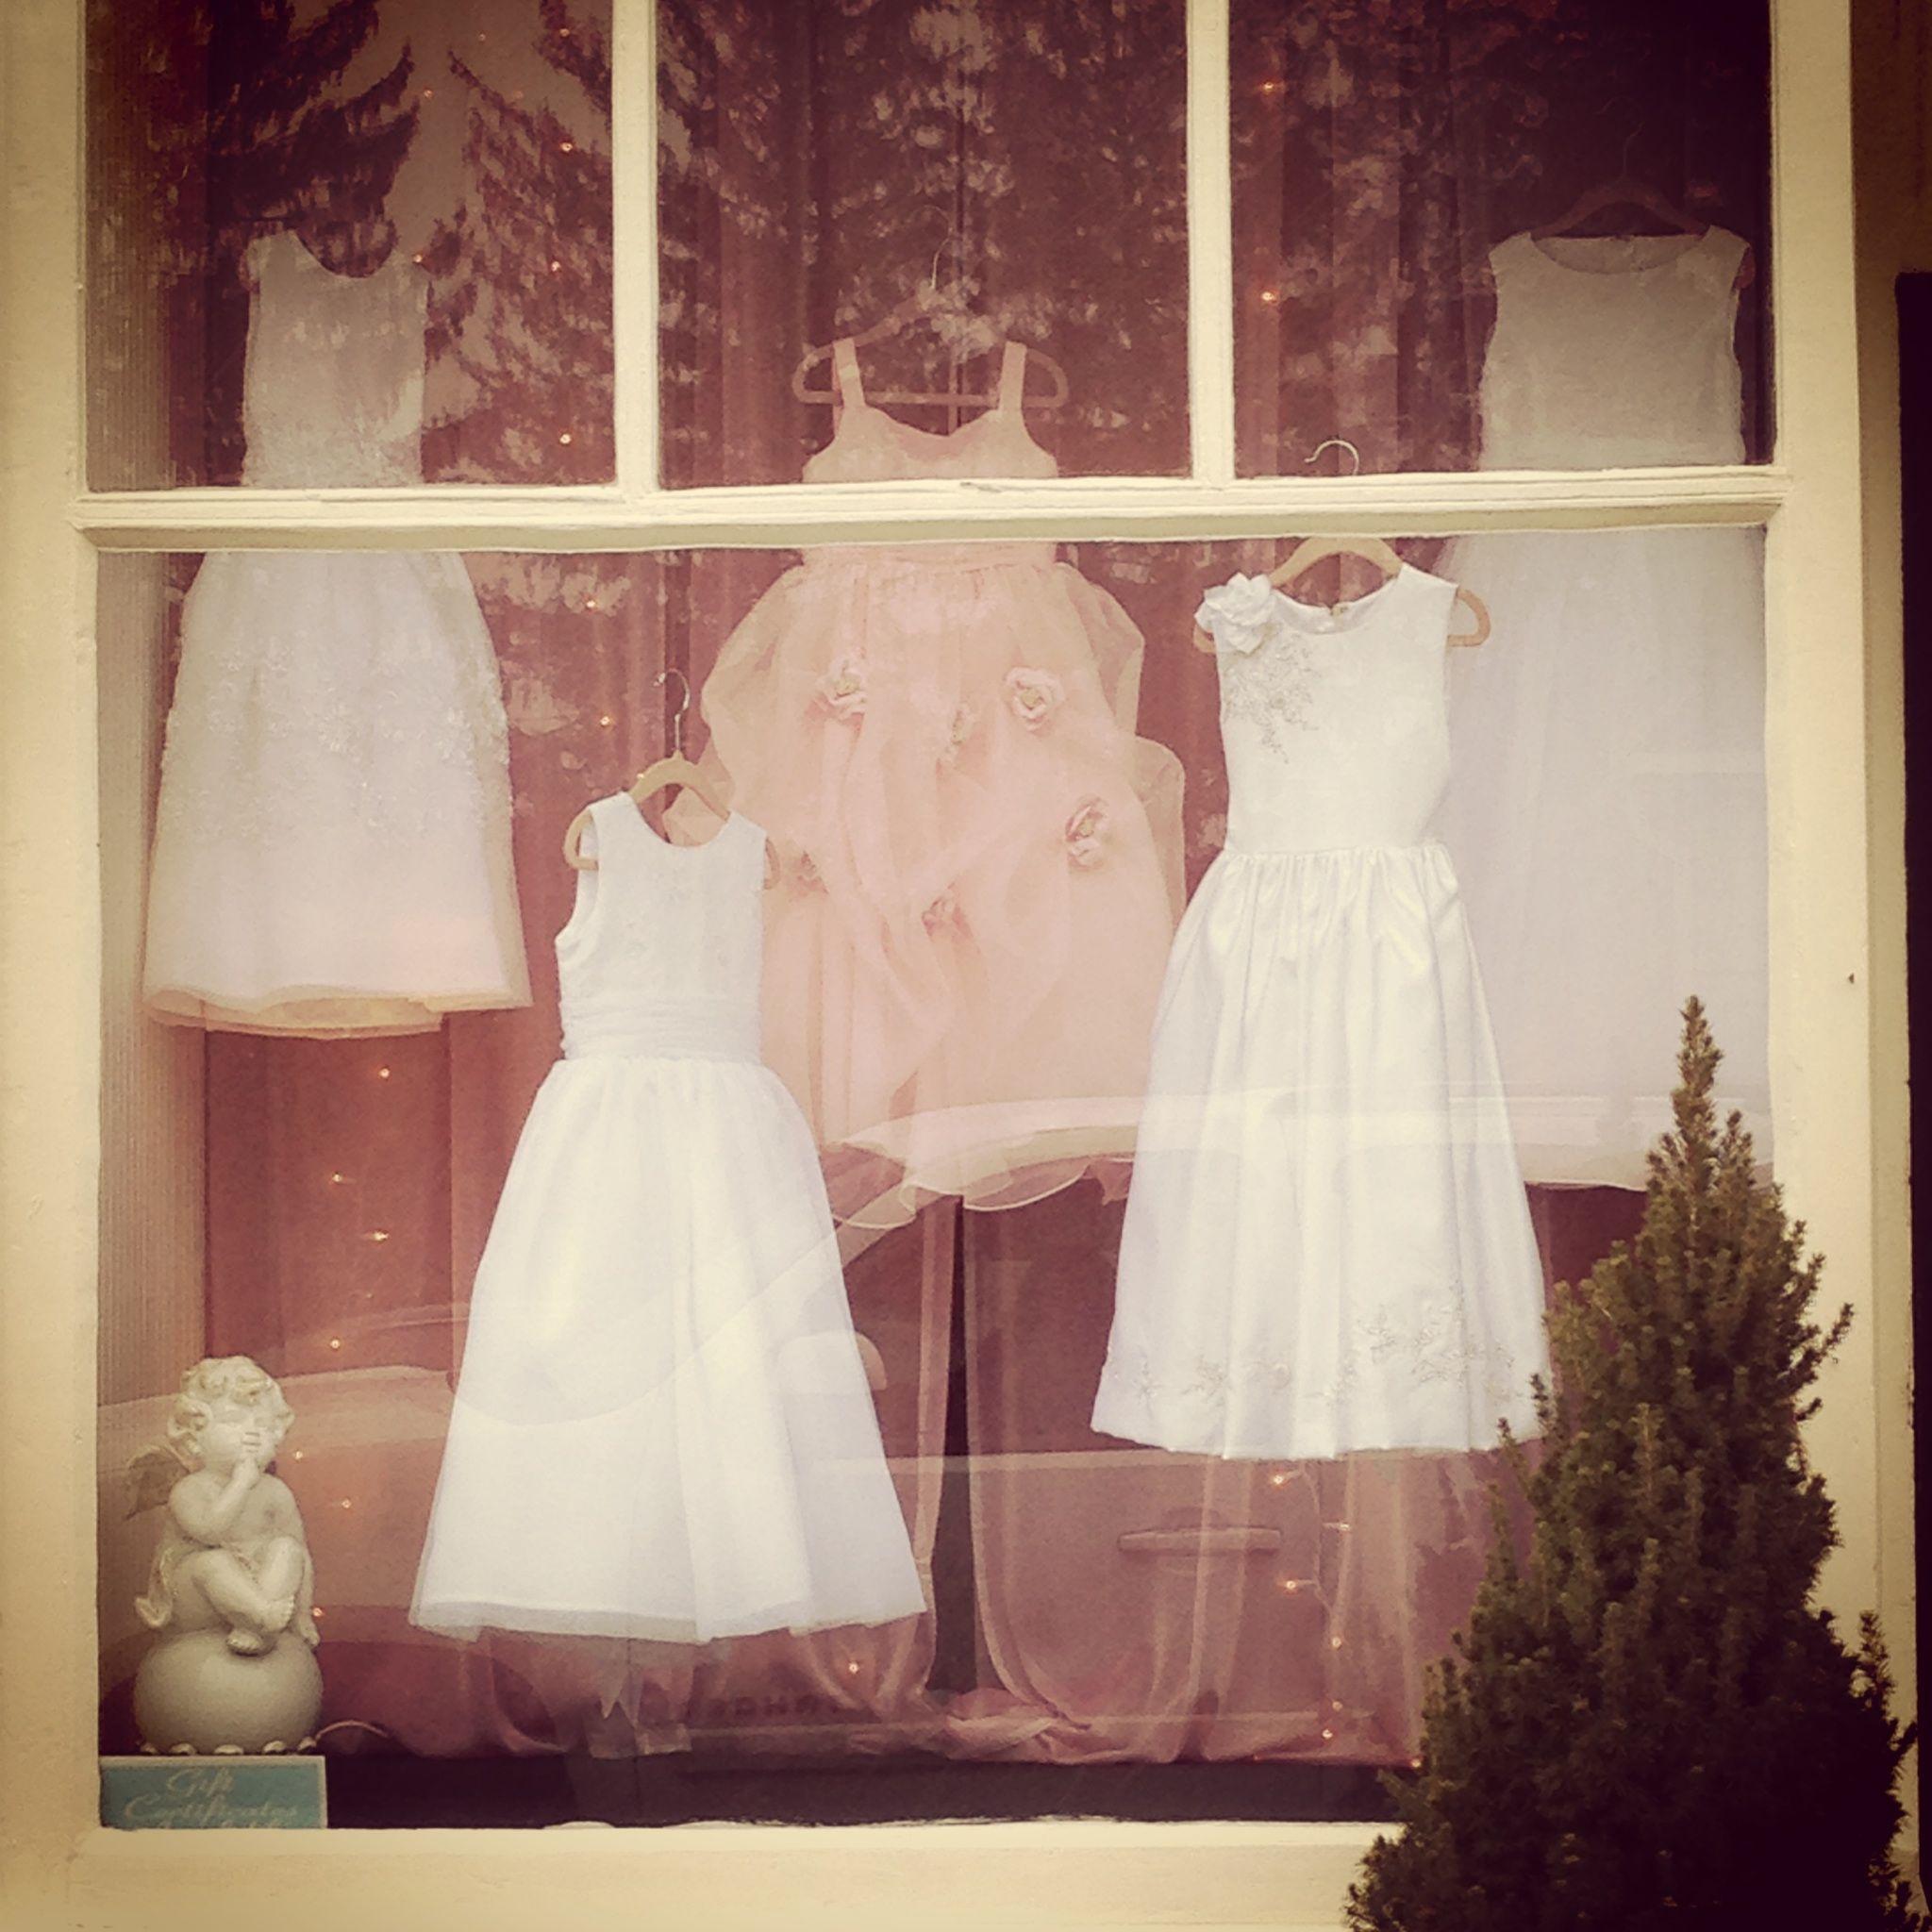 ba6e71f8feb0 Flower Girl Window Display @ Elizabeth Ann's Bridal Boutique 1148 Main ST  HOLDEN MA EDEN FLOWER DESSY FLOWER GIRL AND JOAN CALABRESE